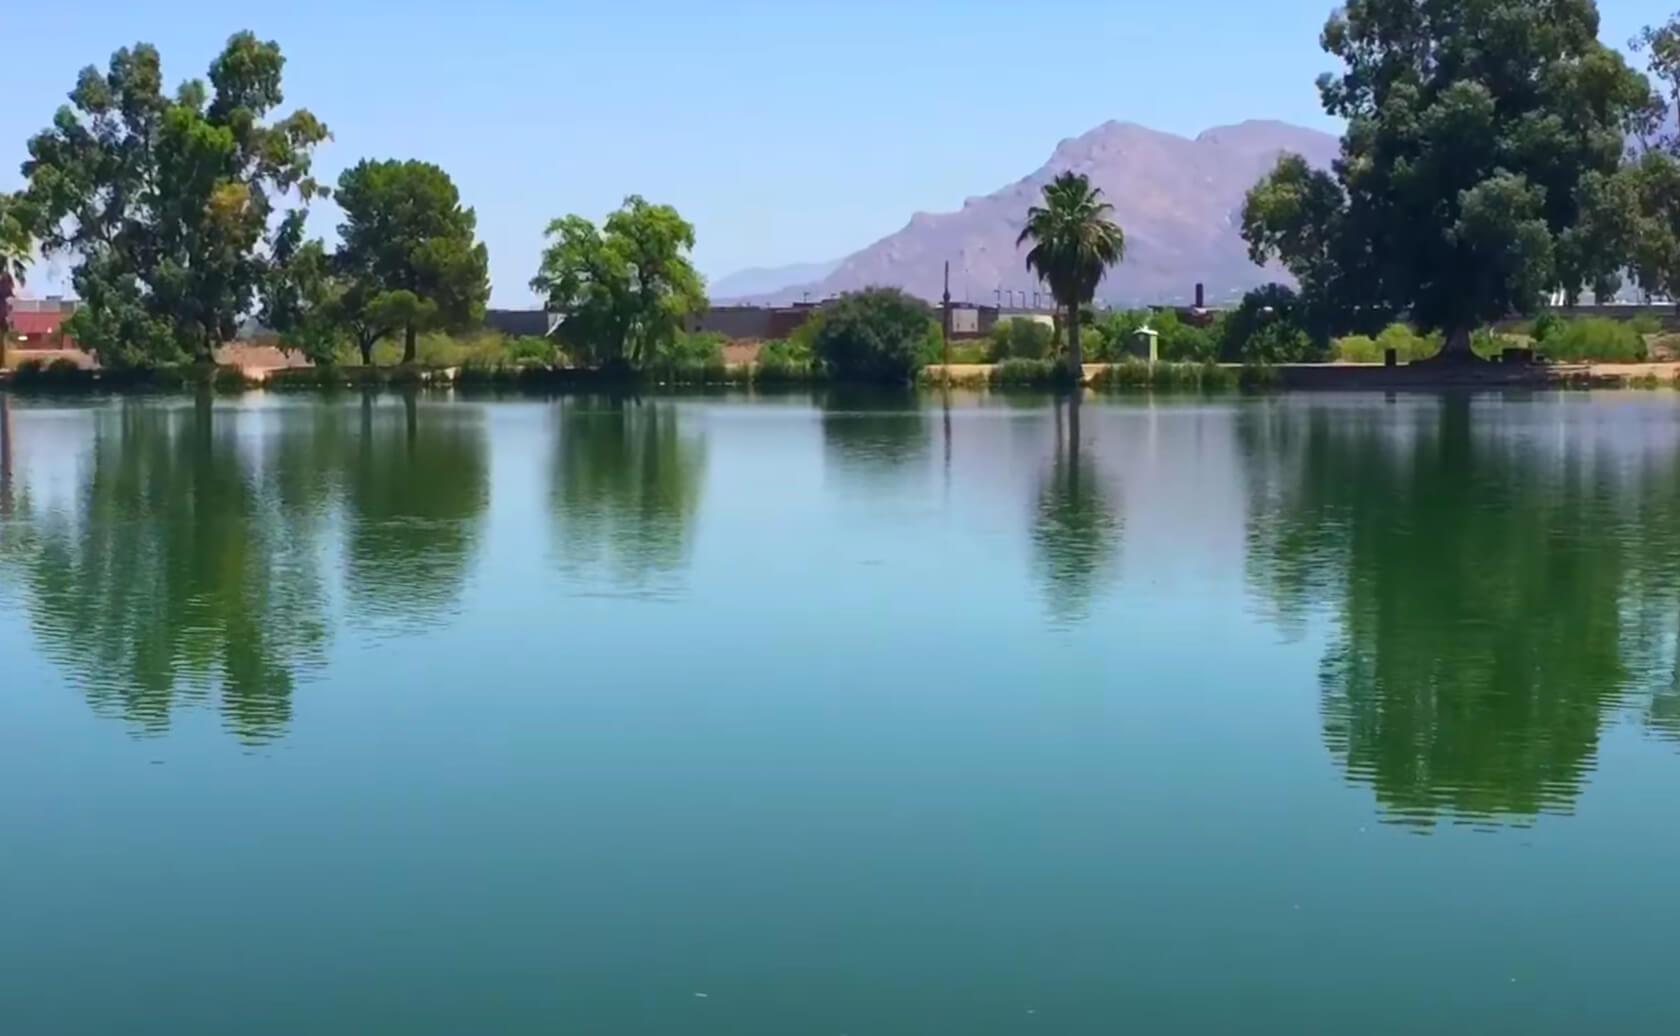 Silverbell-Lake-Fishing-Guide-Tucson-AZ-01